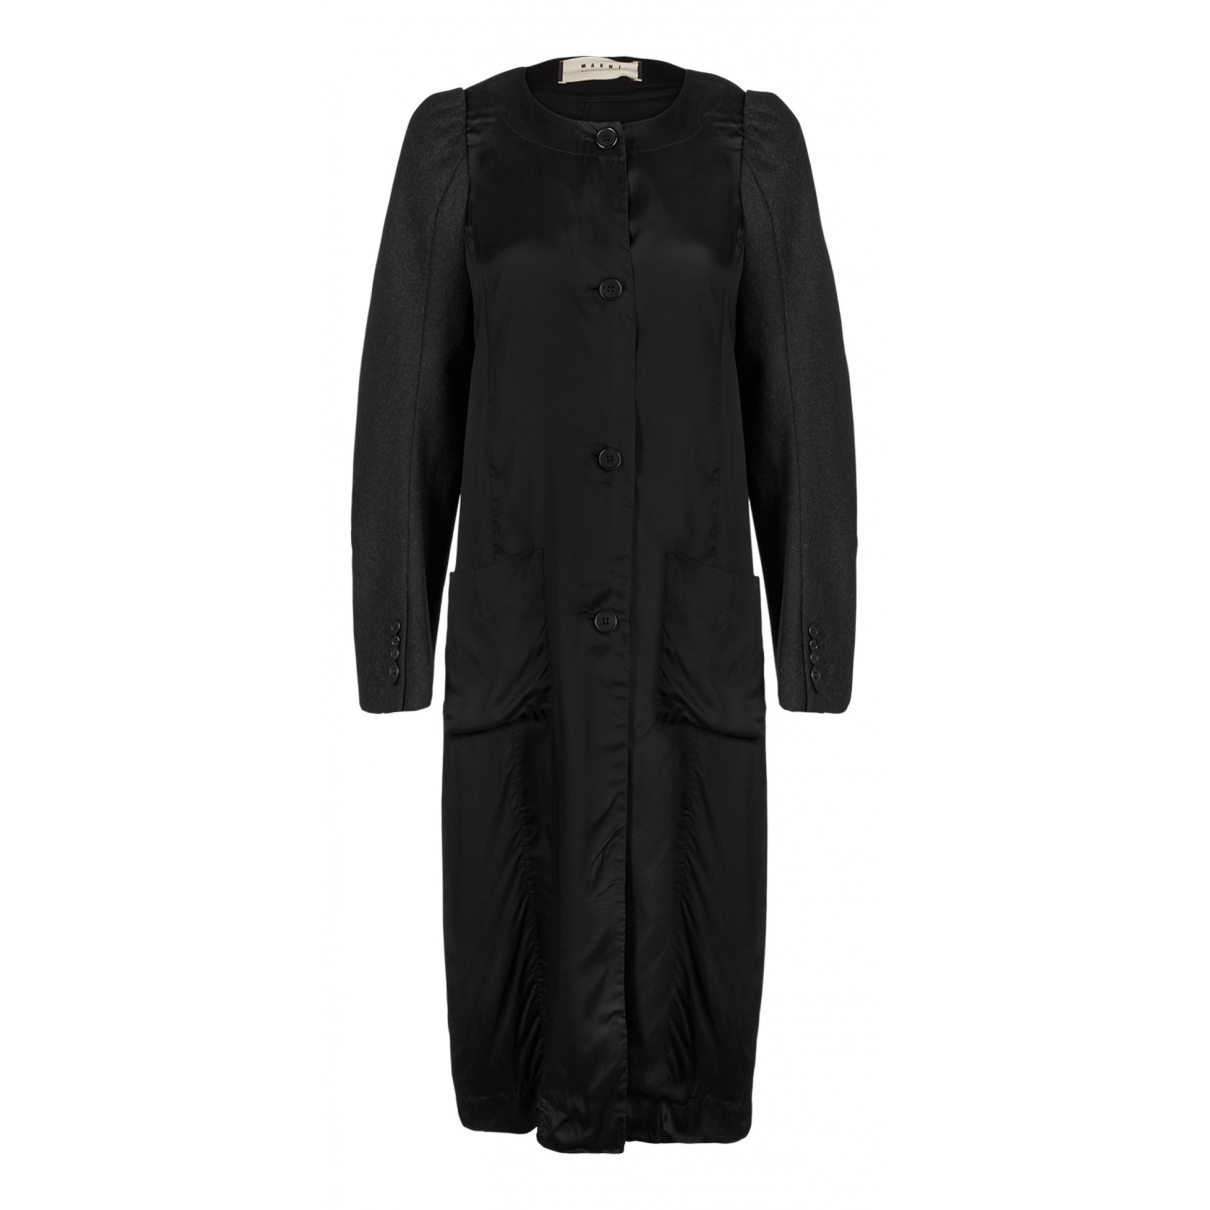 Marni N Multicolour jacket for Women 10 UK